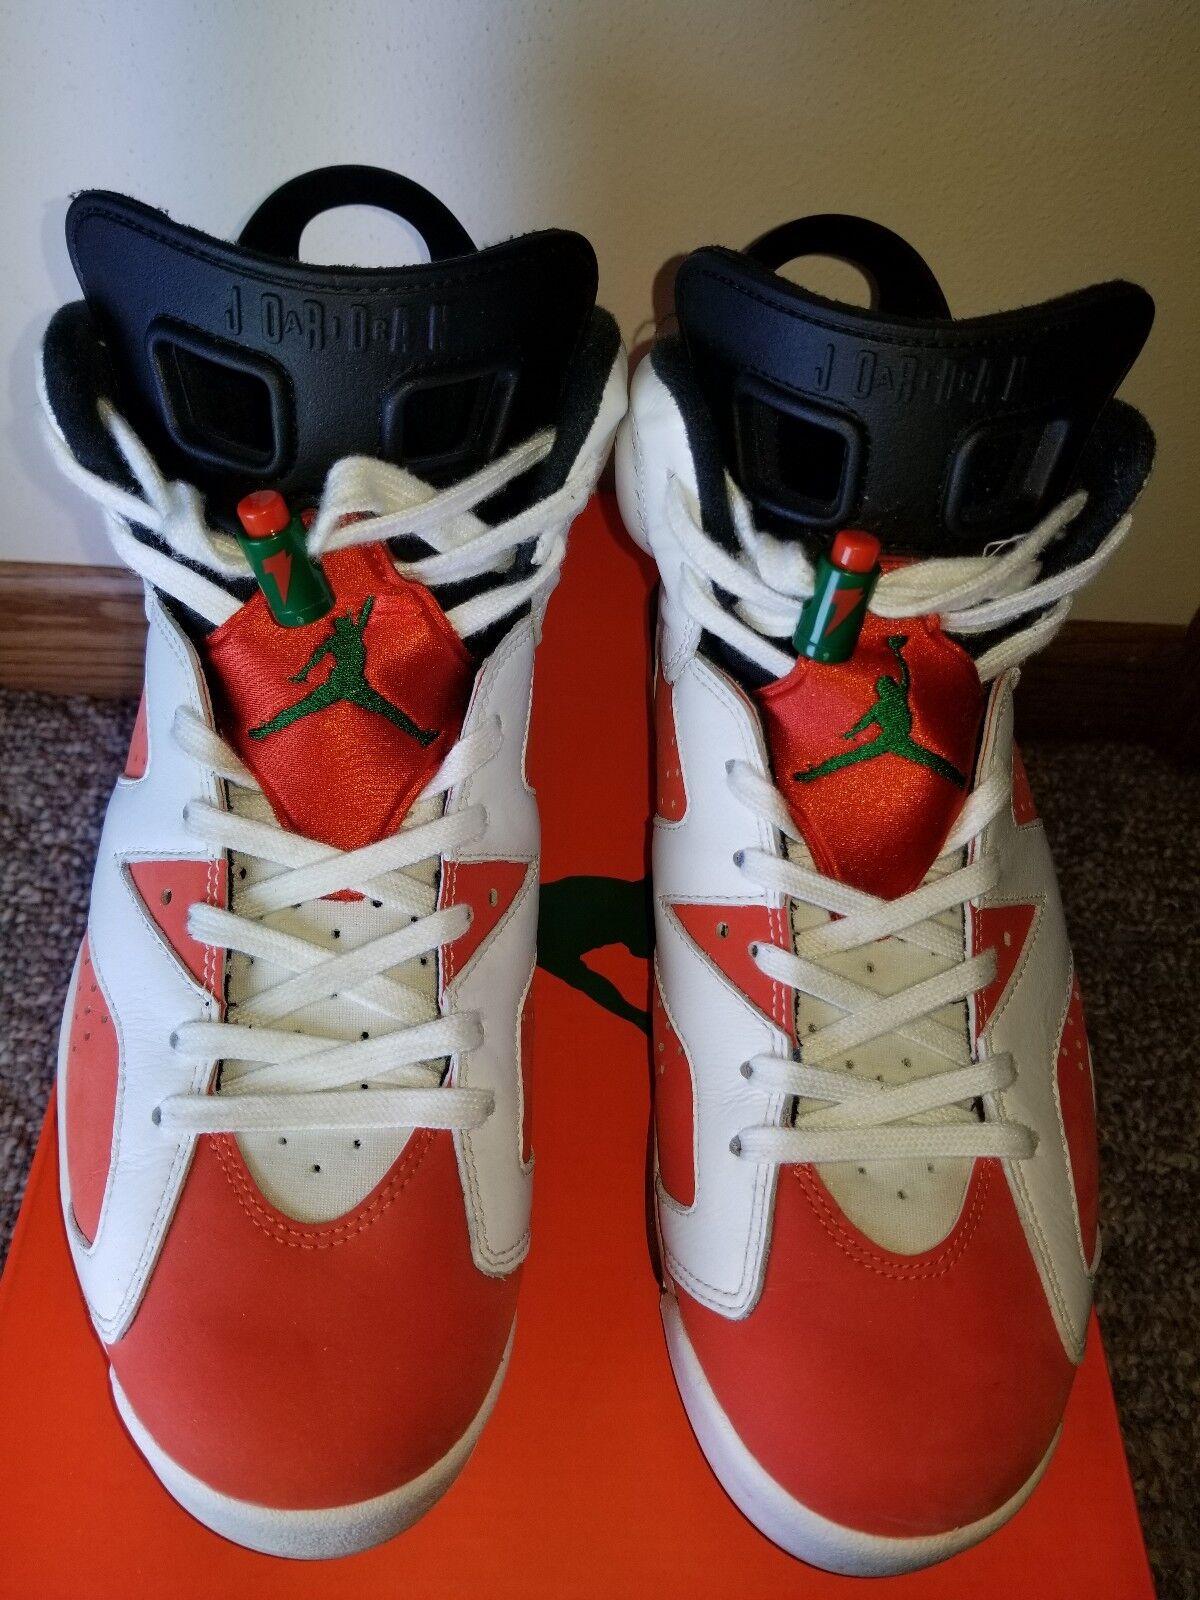 Air Jordan 6 Retro Gatorade Orange 384664 145 Size 9.5